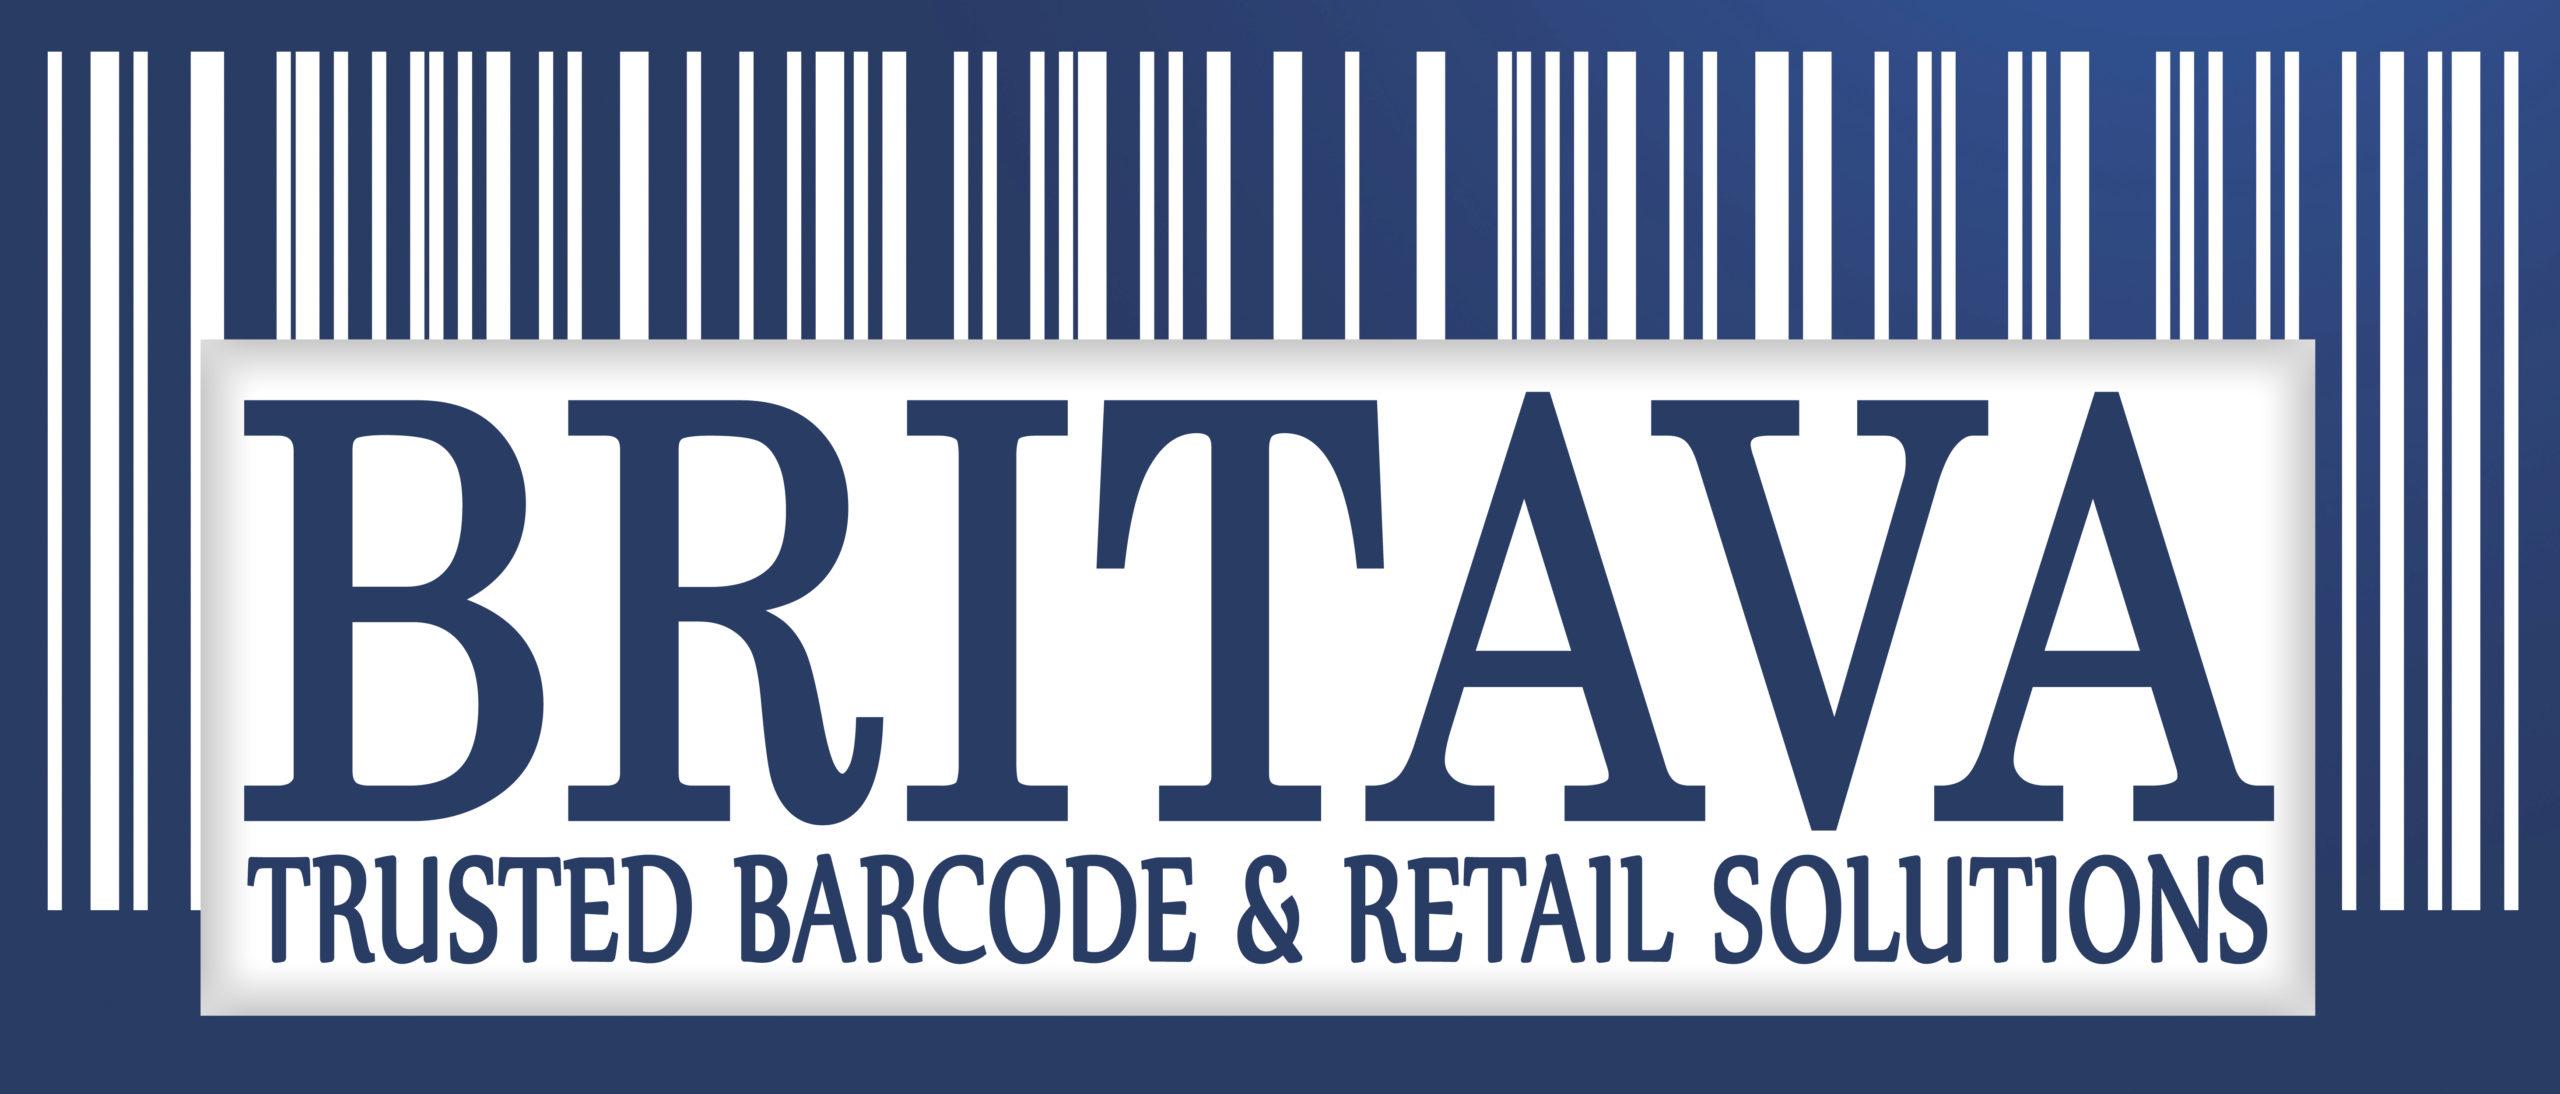 BRITAVA Barcode Solutions Indore